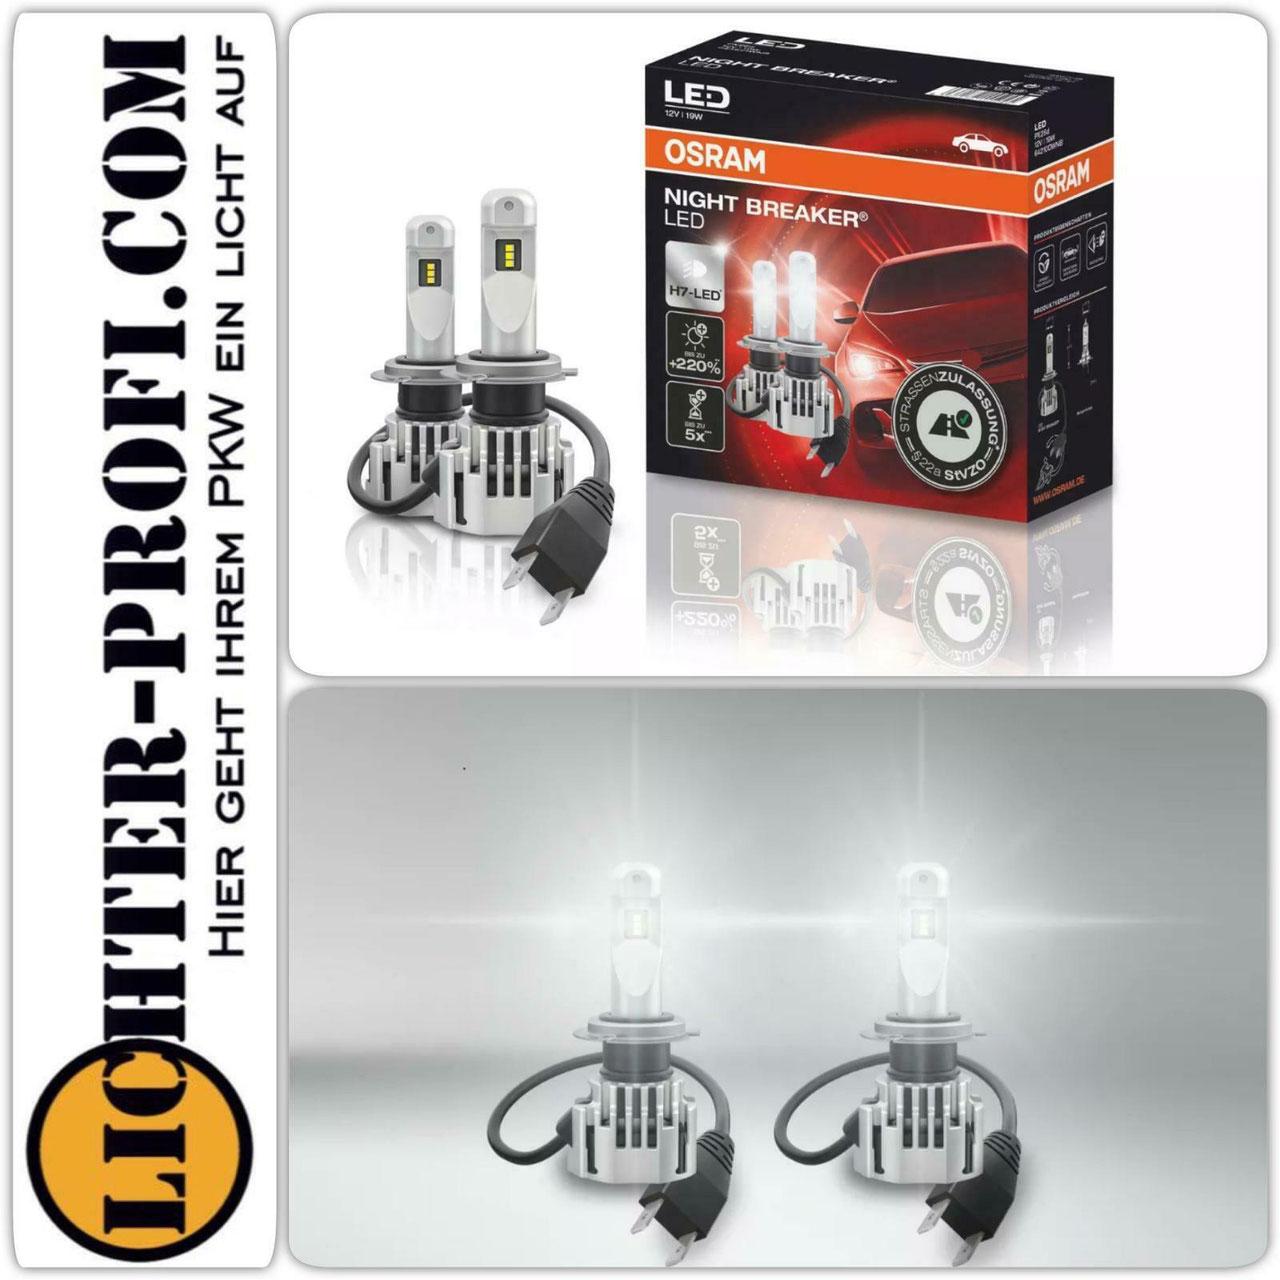 Osram Night Breaker h7 LED mit Zulassung